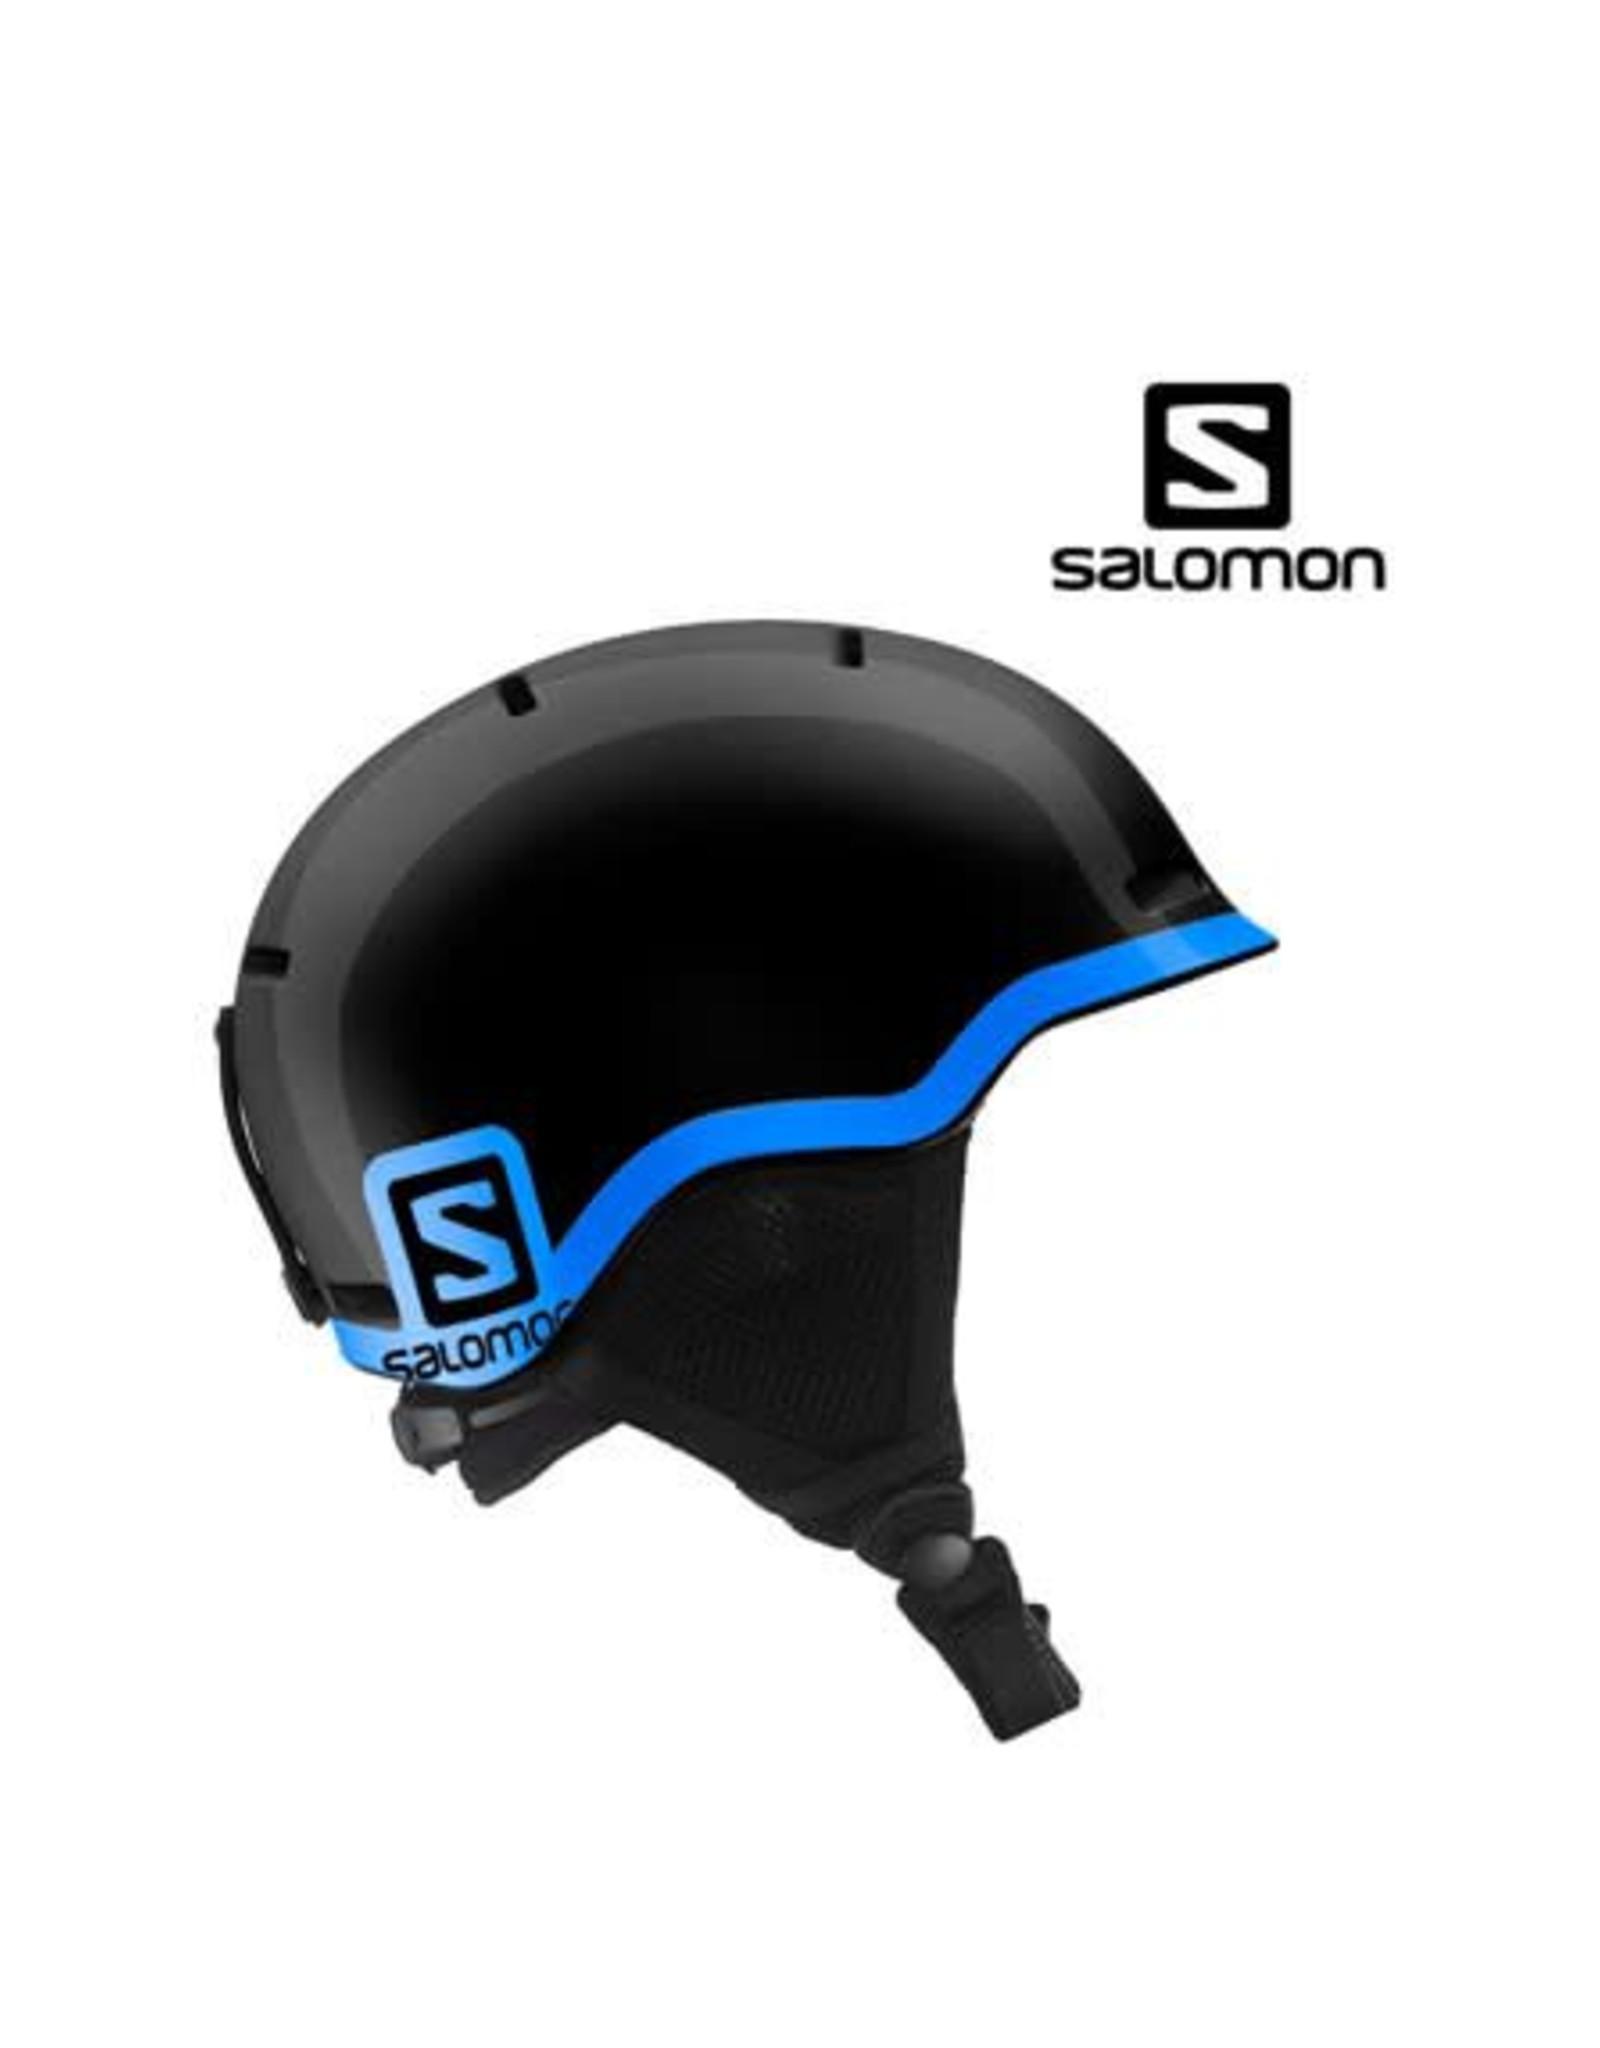 SALOMON Skihelm Salomon GROM Black/Blue S (49/53)